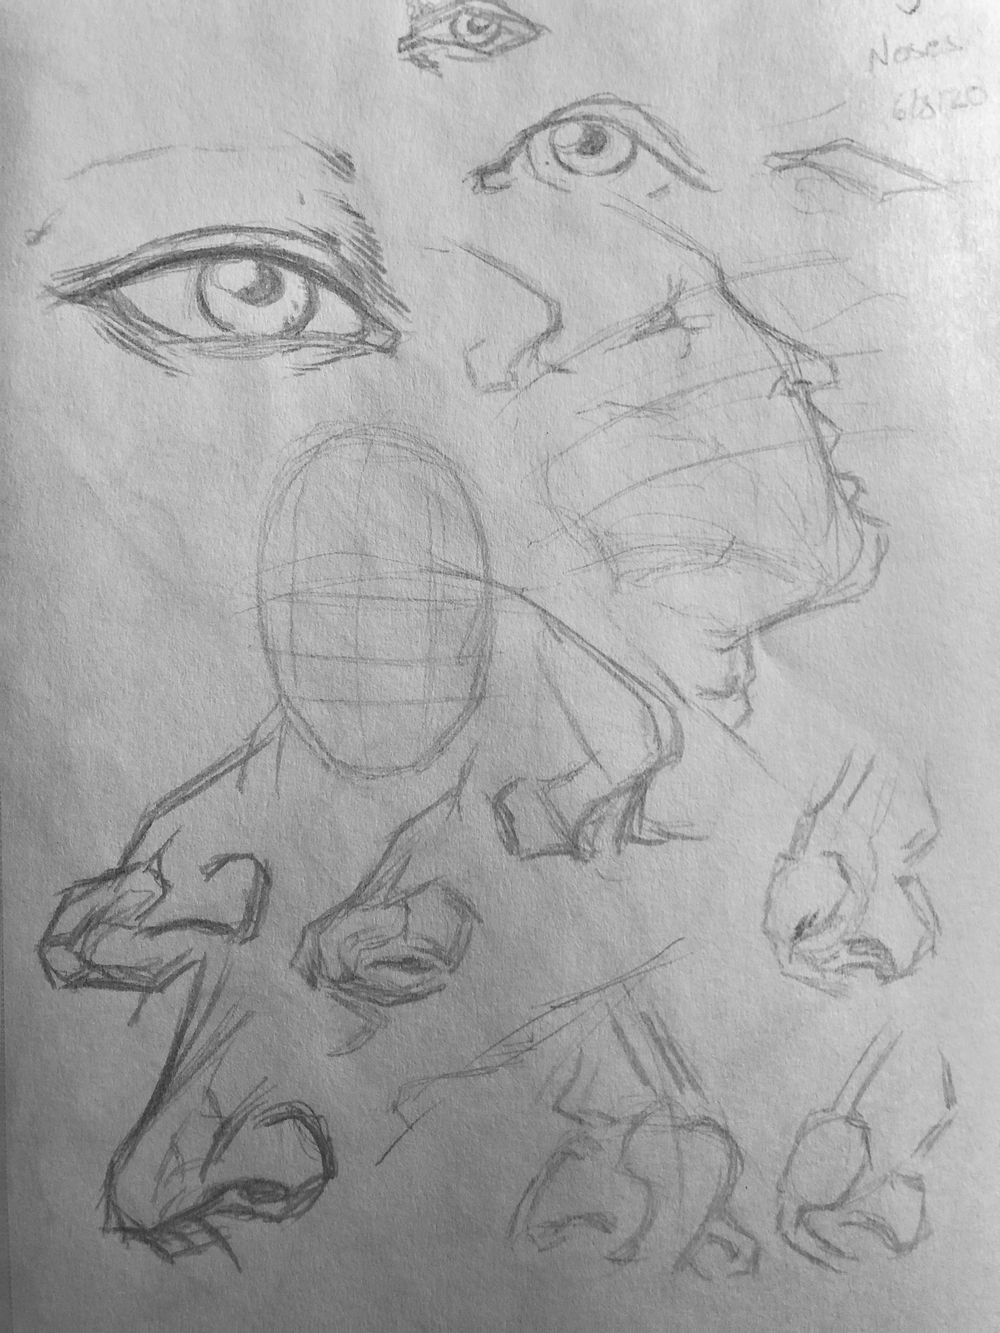 Superhero Head Studies - image 3 - student project